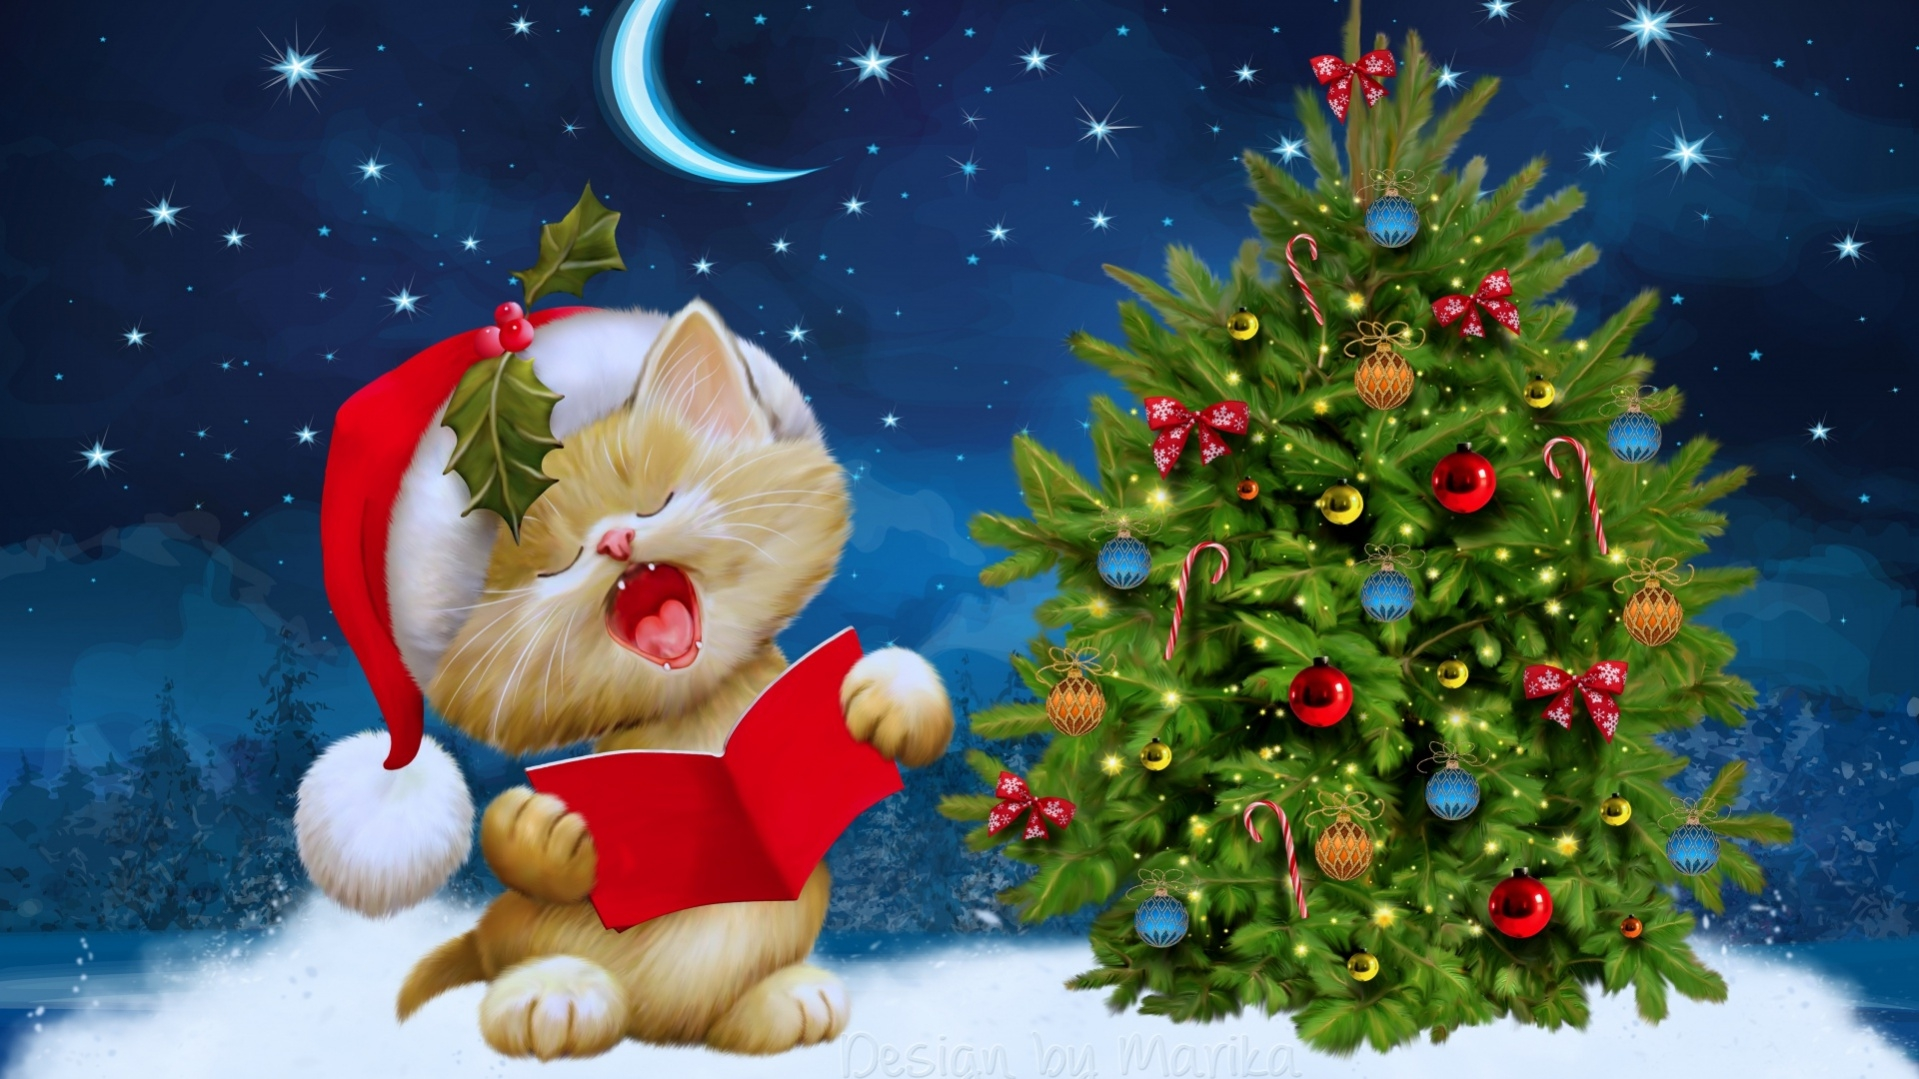 Animated Christmas Backgrounds